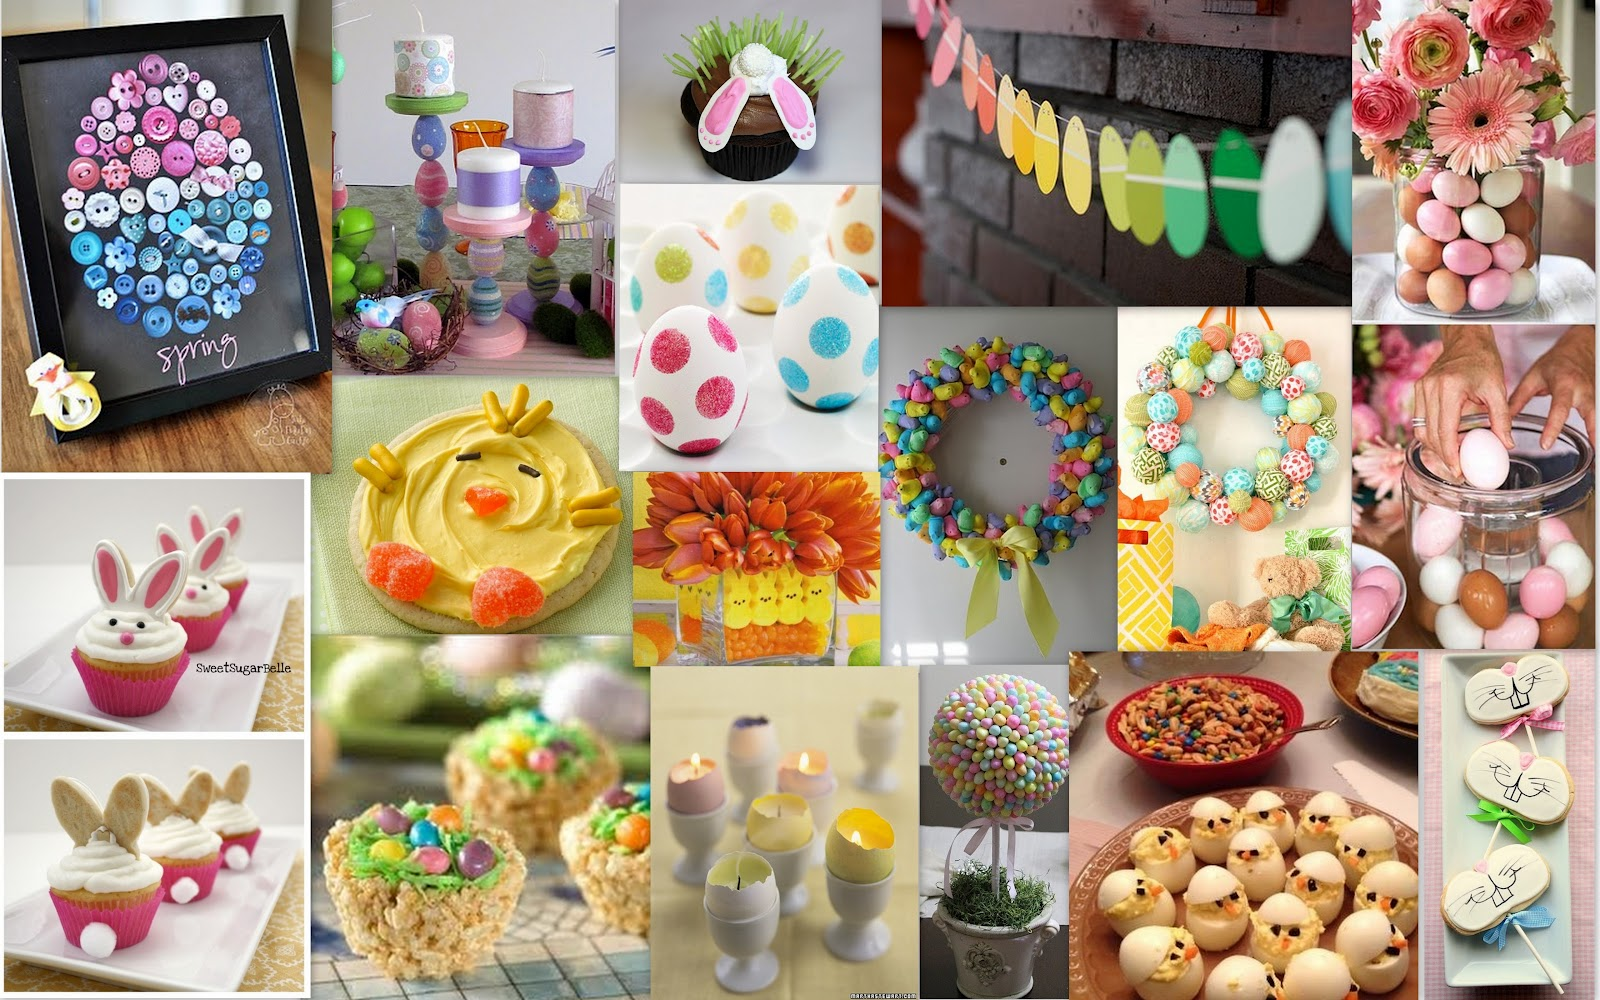 Crafts easter spring pinterest ask home design for Easter decorations for the home pinterest